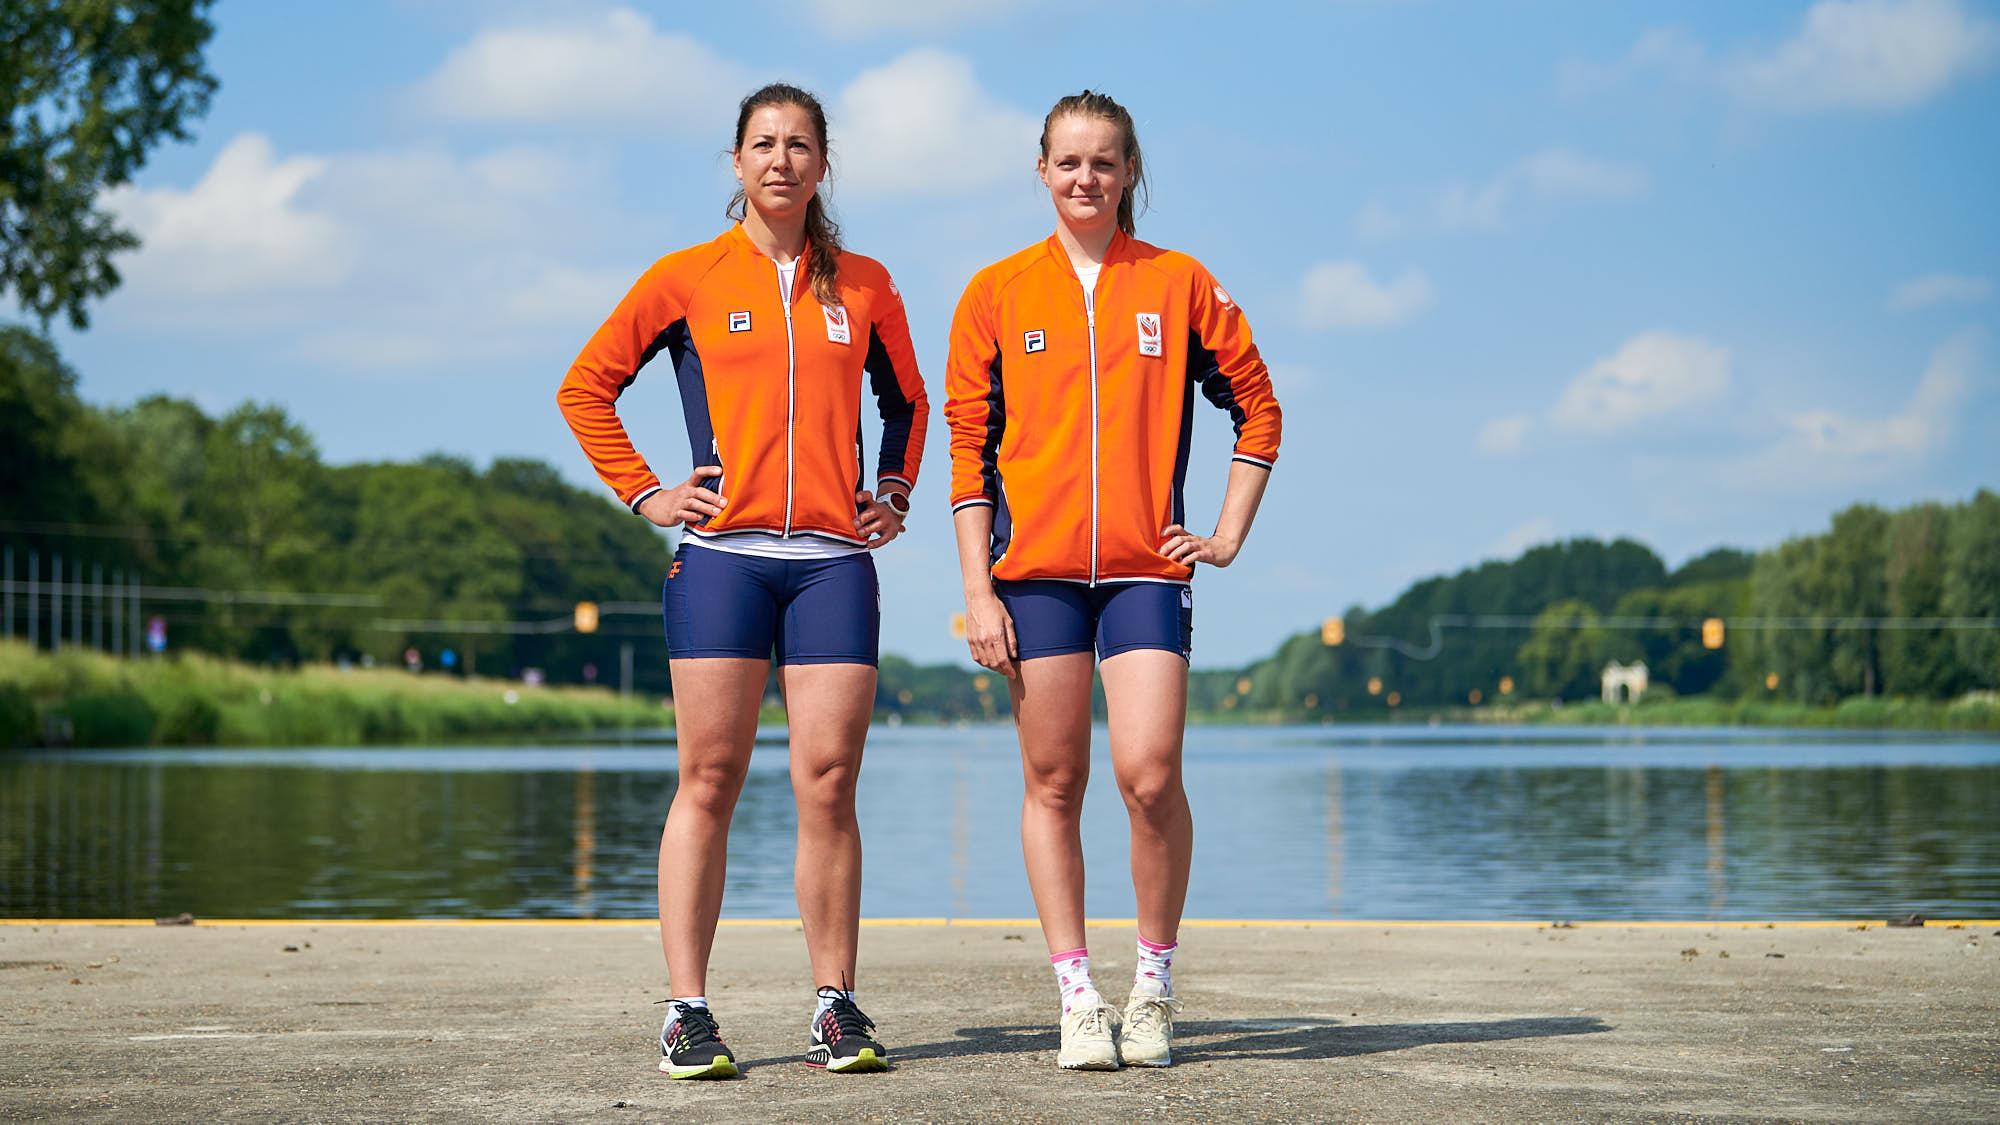 Portrait of top Dutch rowing athletes Ilse Paulis and Marieke Keijser